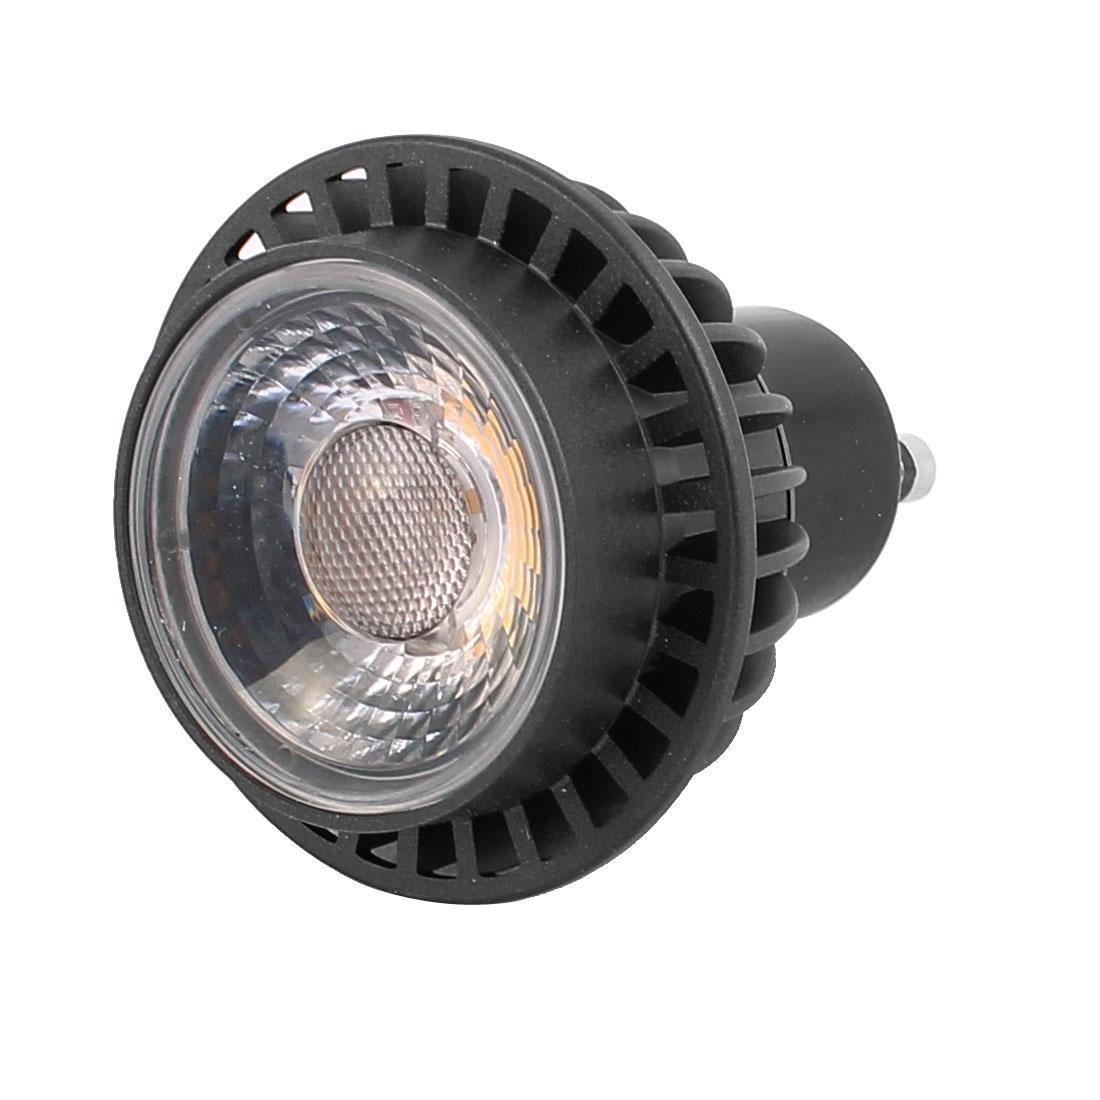 AC85-265V 3W GU10 COB LED Spotlight Lamp Bulb Downlight Cylinder Warm White